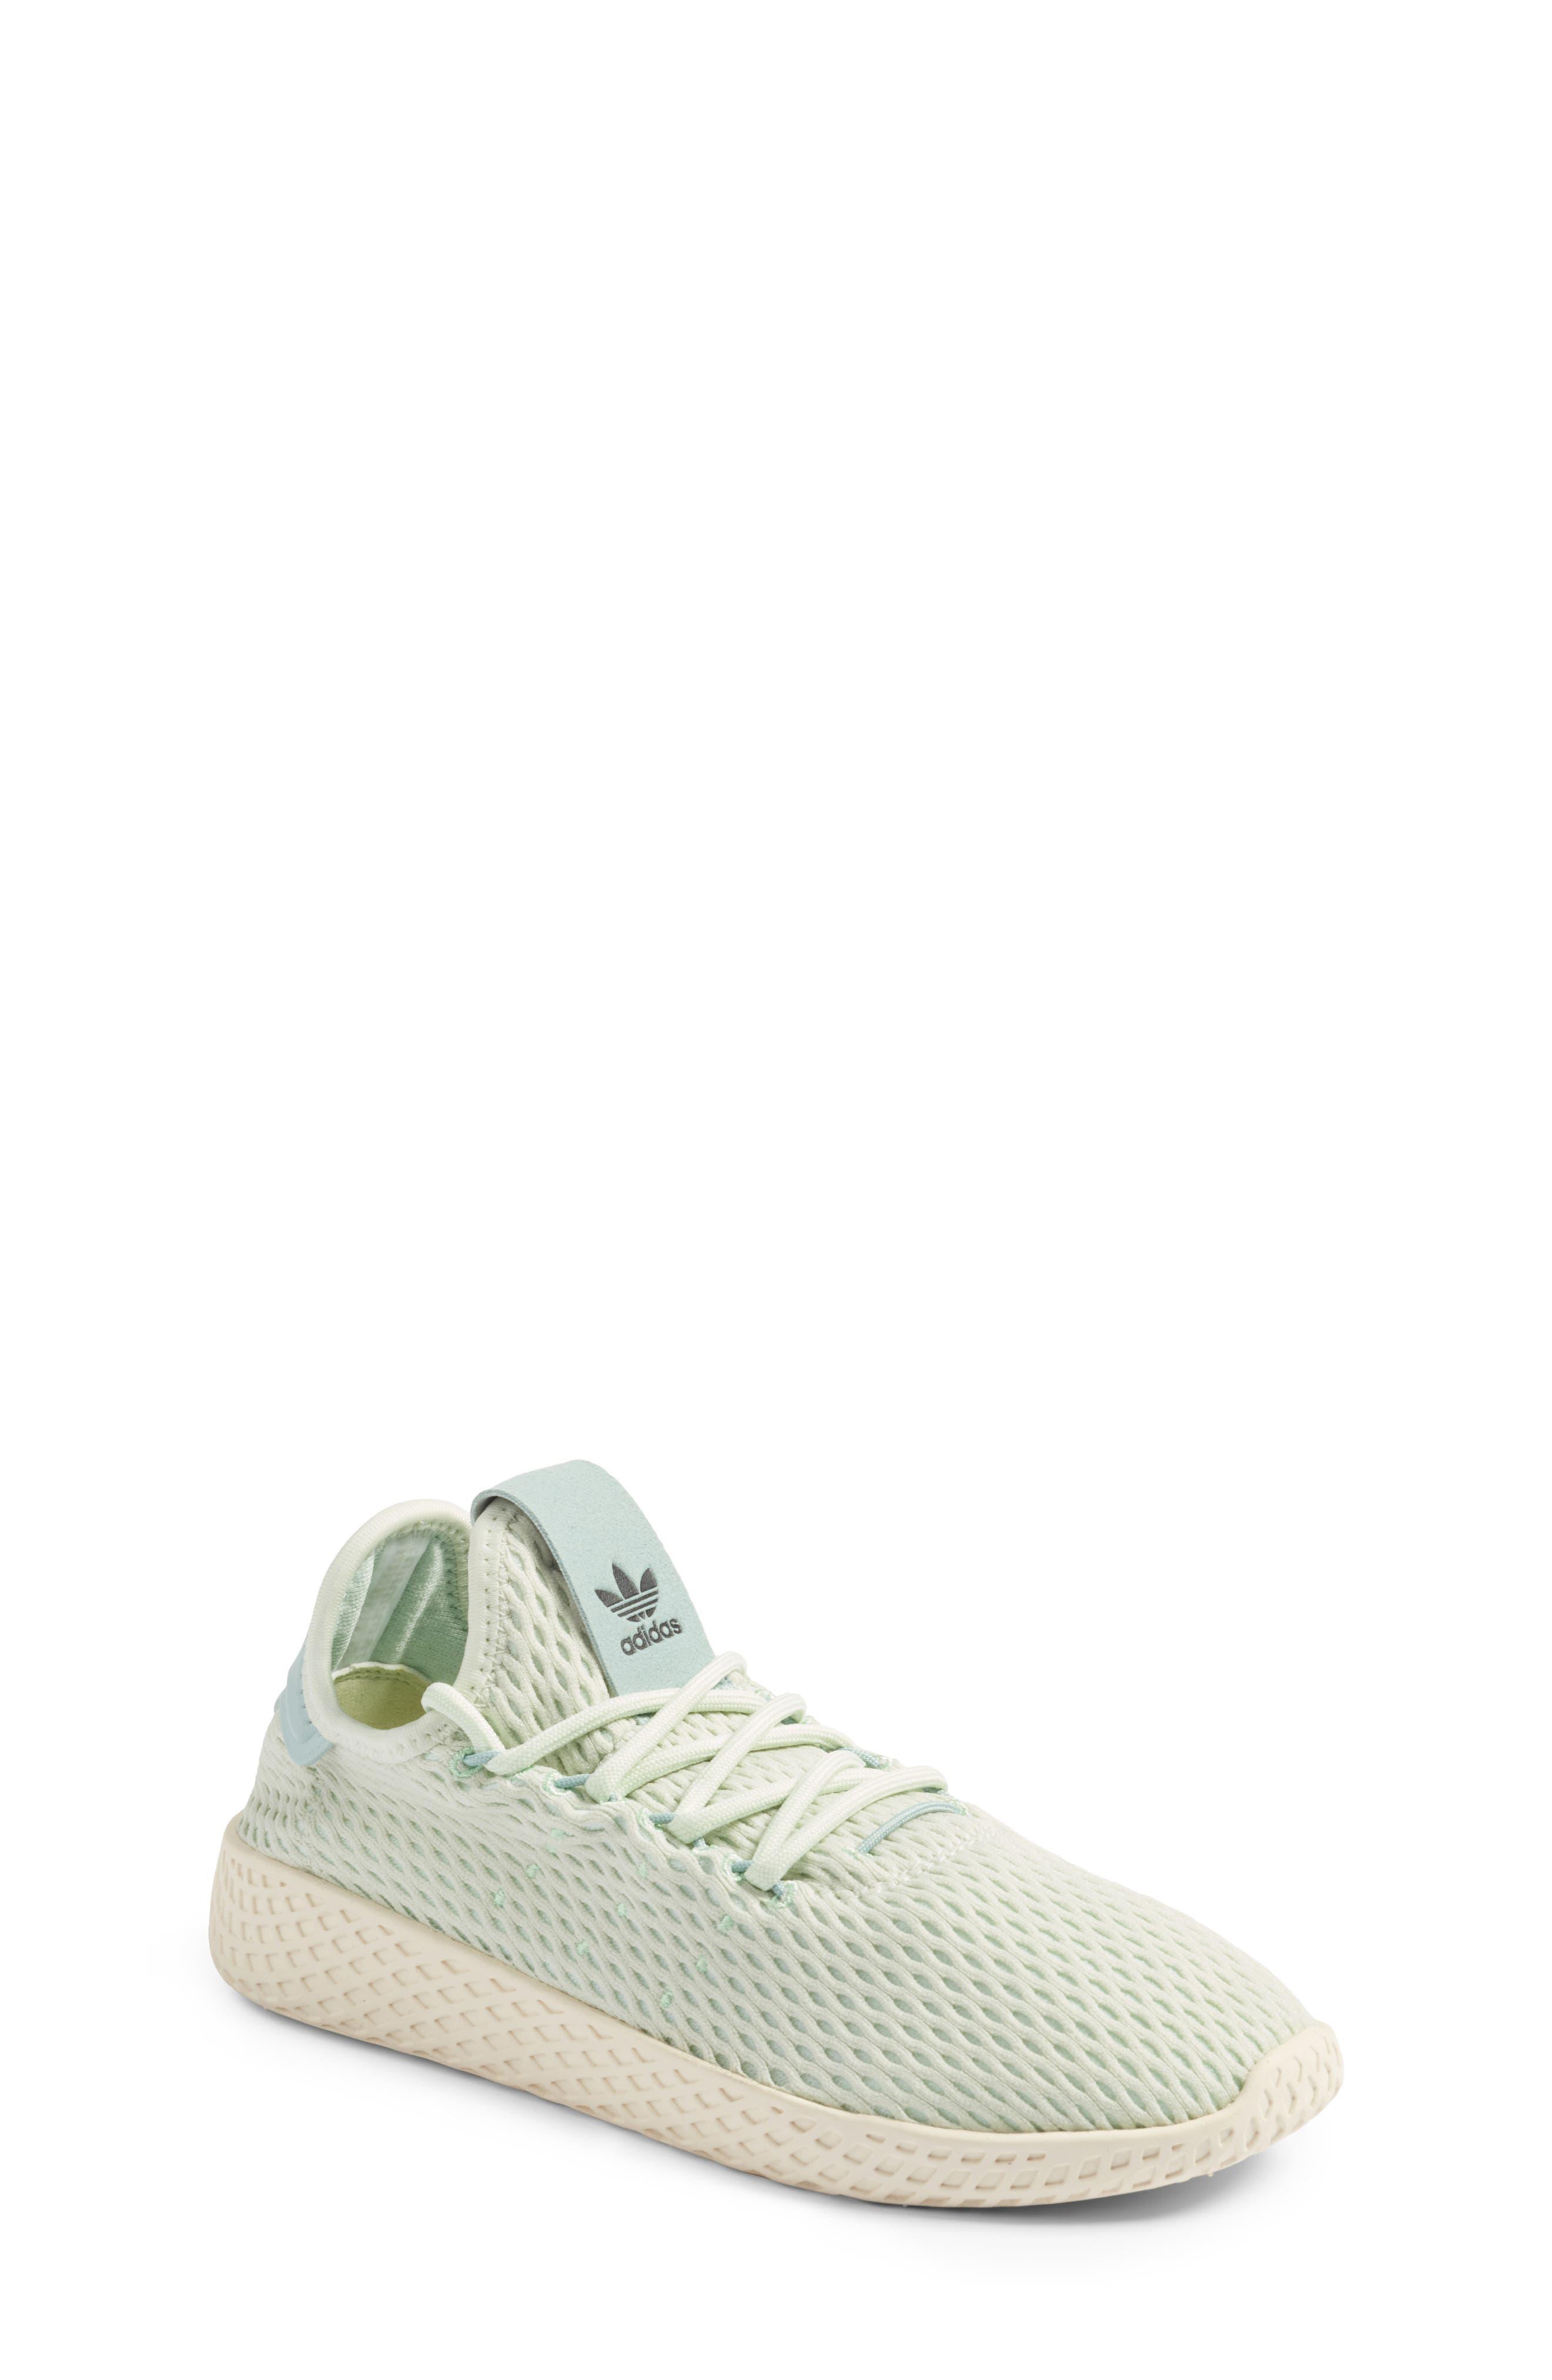 Originals x Pharrell Williams The Summers Mesh Sneaker,                         Main,                         color, 334